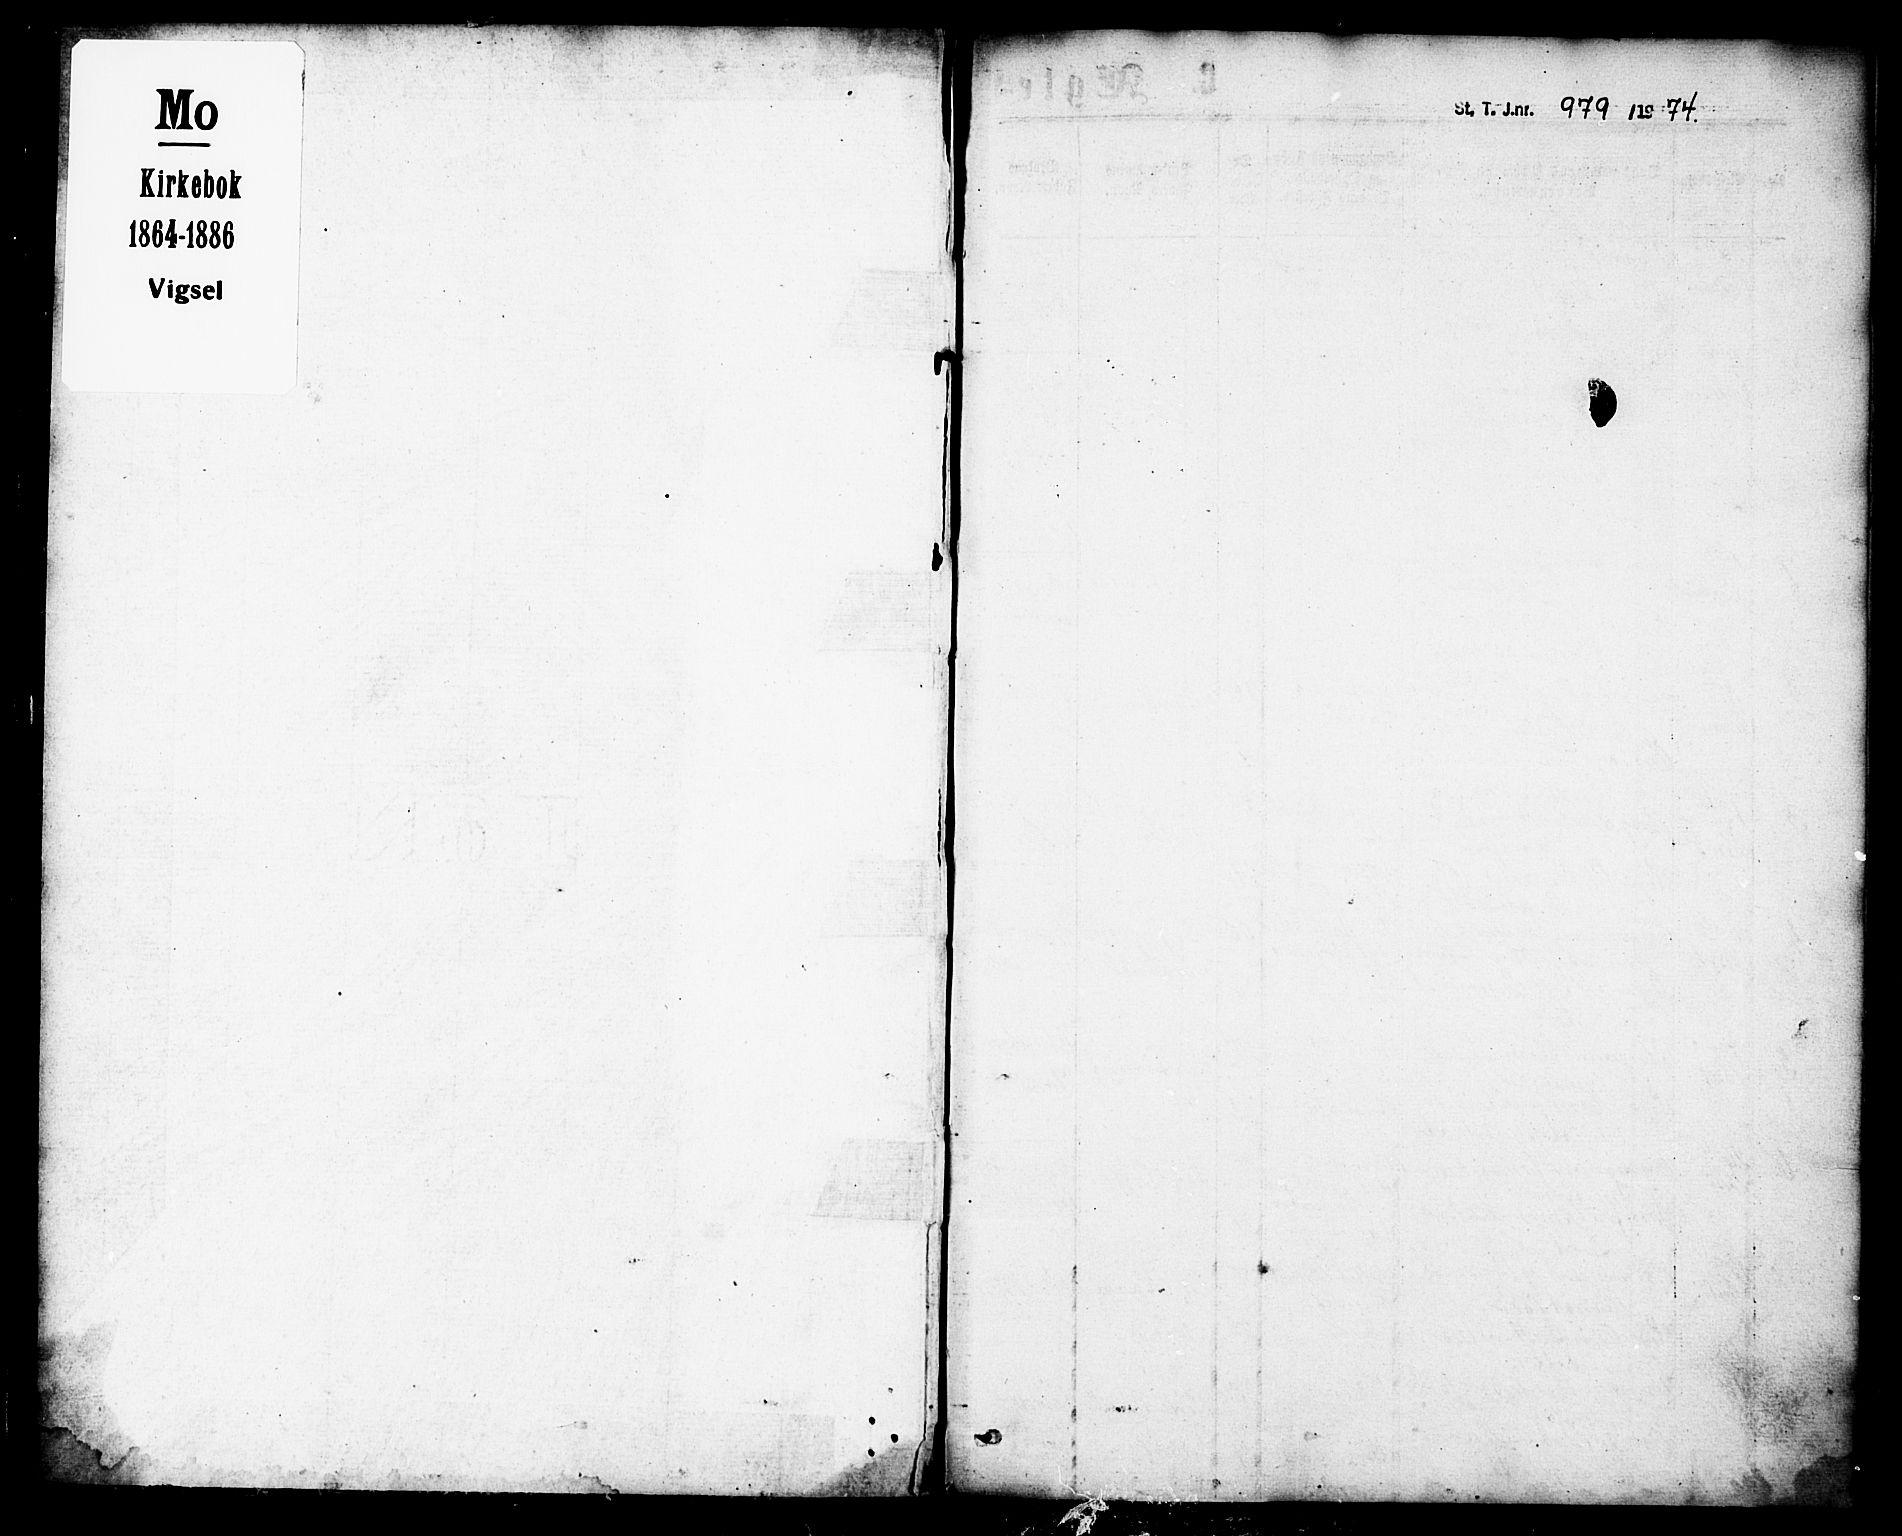 SAT, Ministerialprotokoller, klokkerbøker og fødselsregistre - Nordland, 827/L0395: Ministerialbok nr. 827A07, 1864-1886